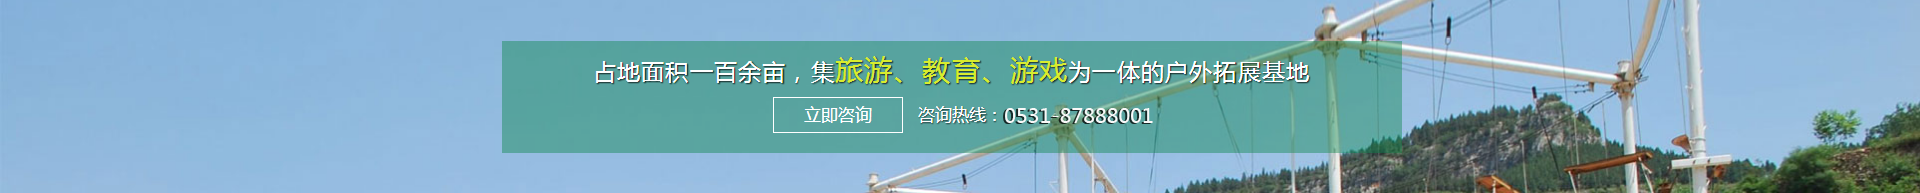 QQ截图20190508110206.png